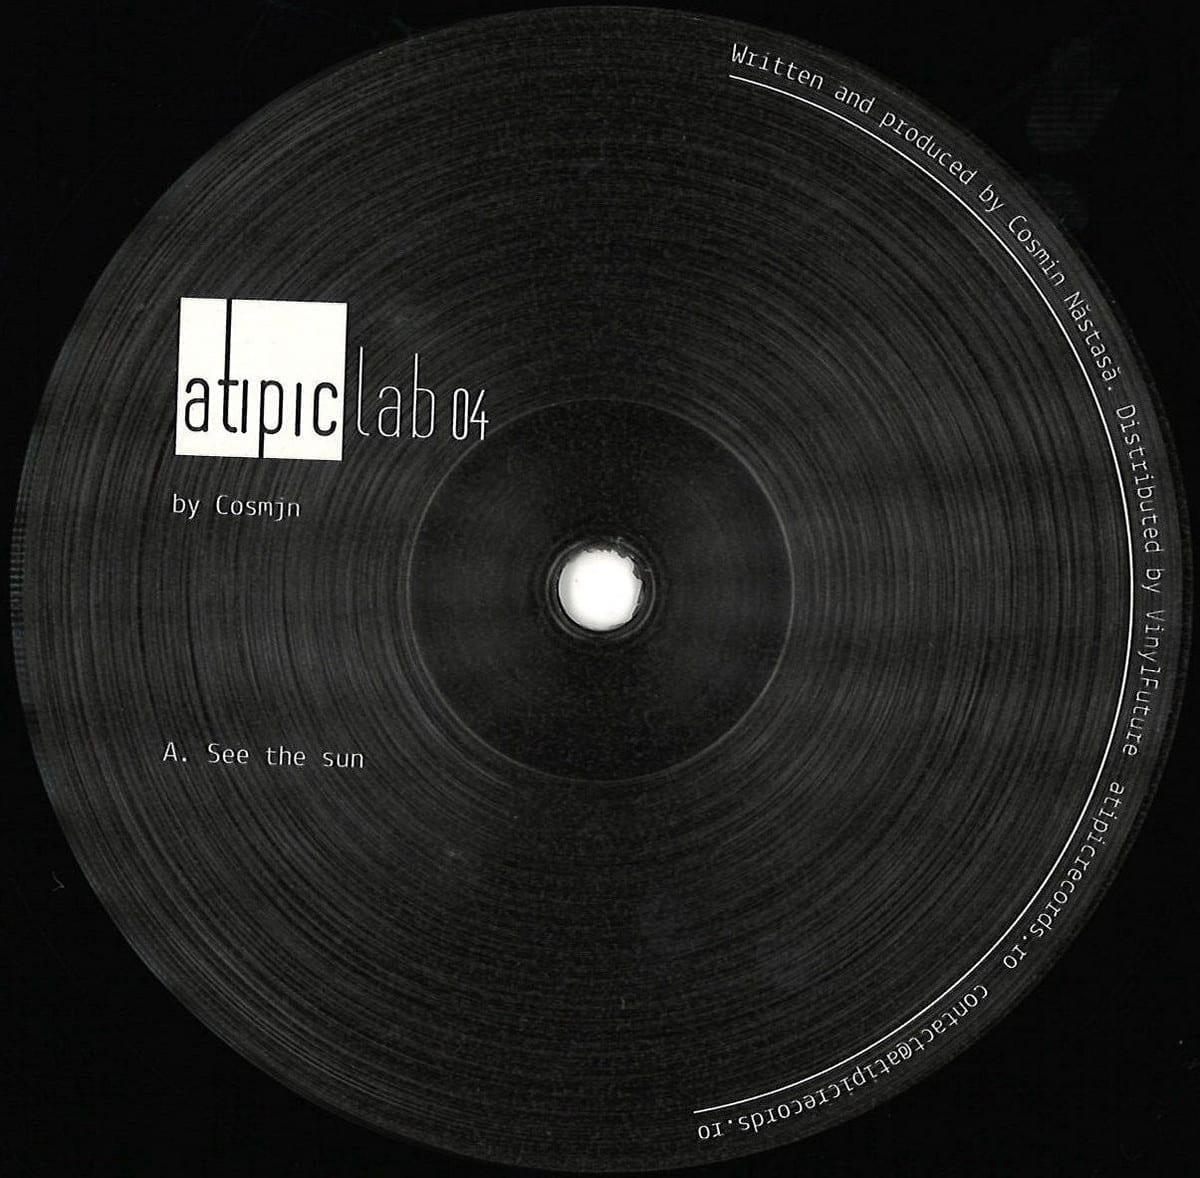 cosmjn - atipic lab 04 [atipiclab] front